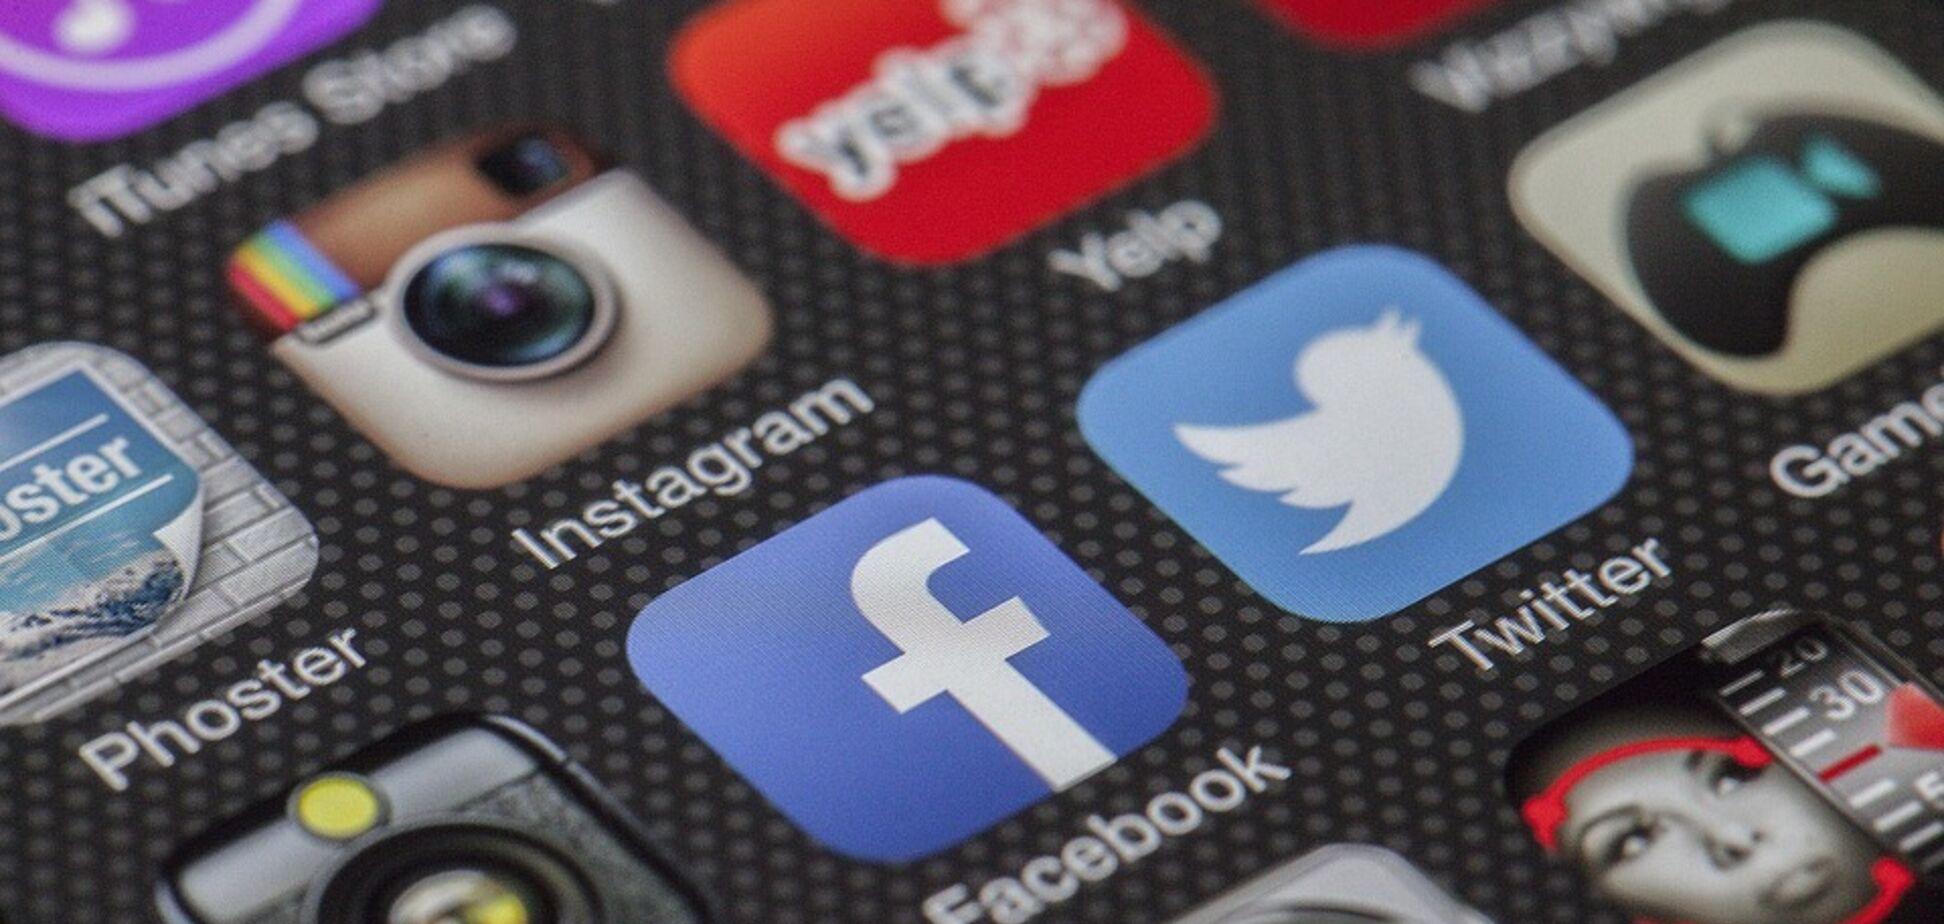 В Instagram, Facebook и WhatsApp произошел сбой